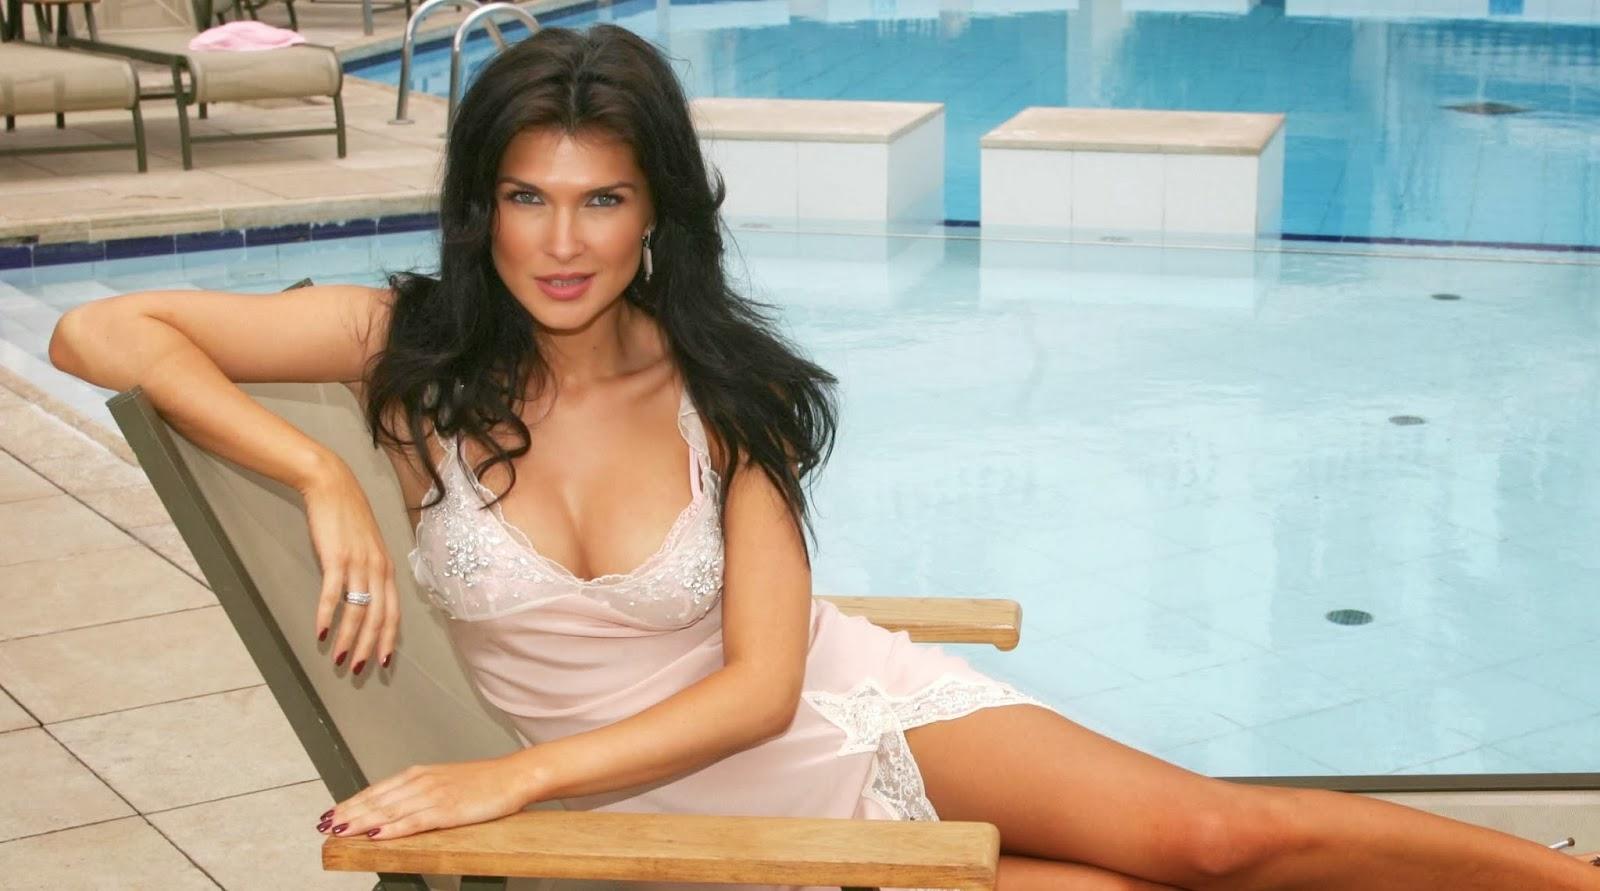 Andrea Osvart Hot Pics andrea osvart actress attends - maternity blues images